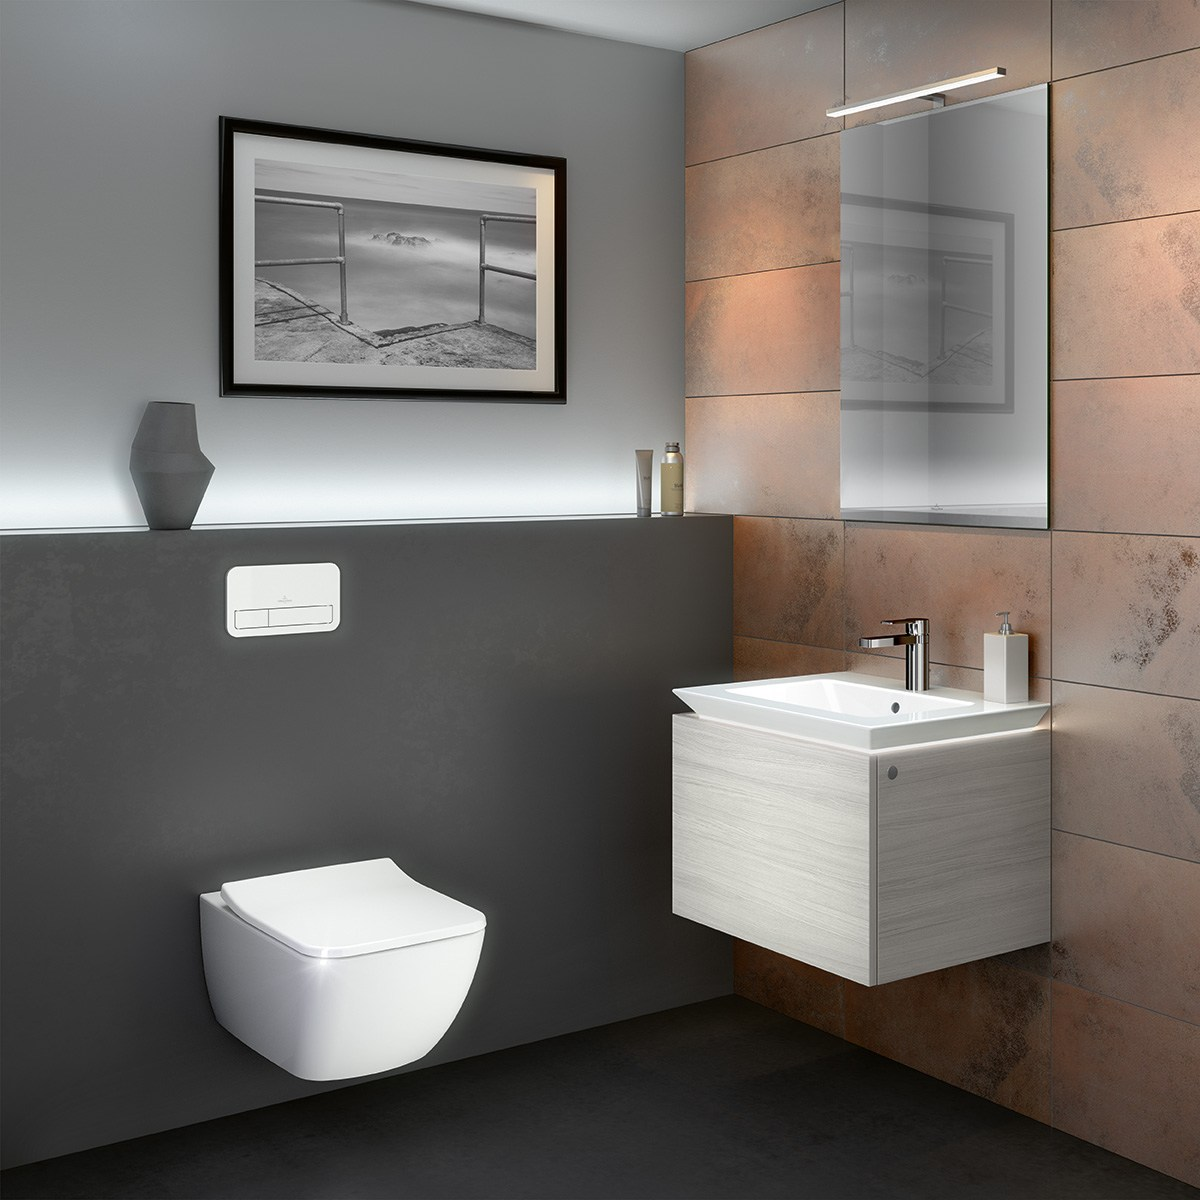 Villeroy and boch bathroom cabinets - Villeroy And Boch Bathroom Cabinets 82